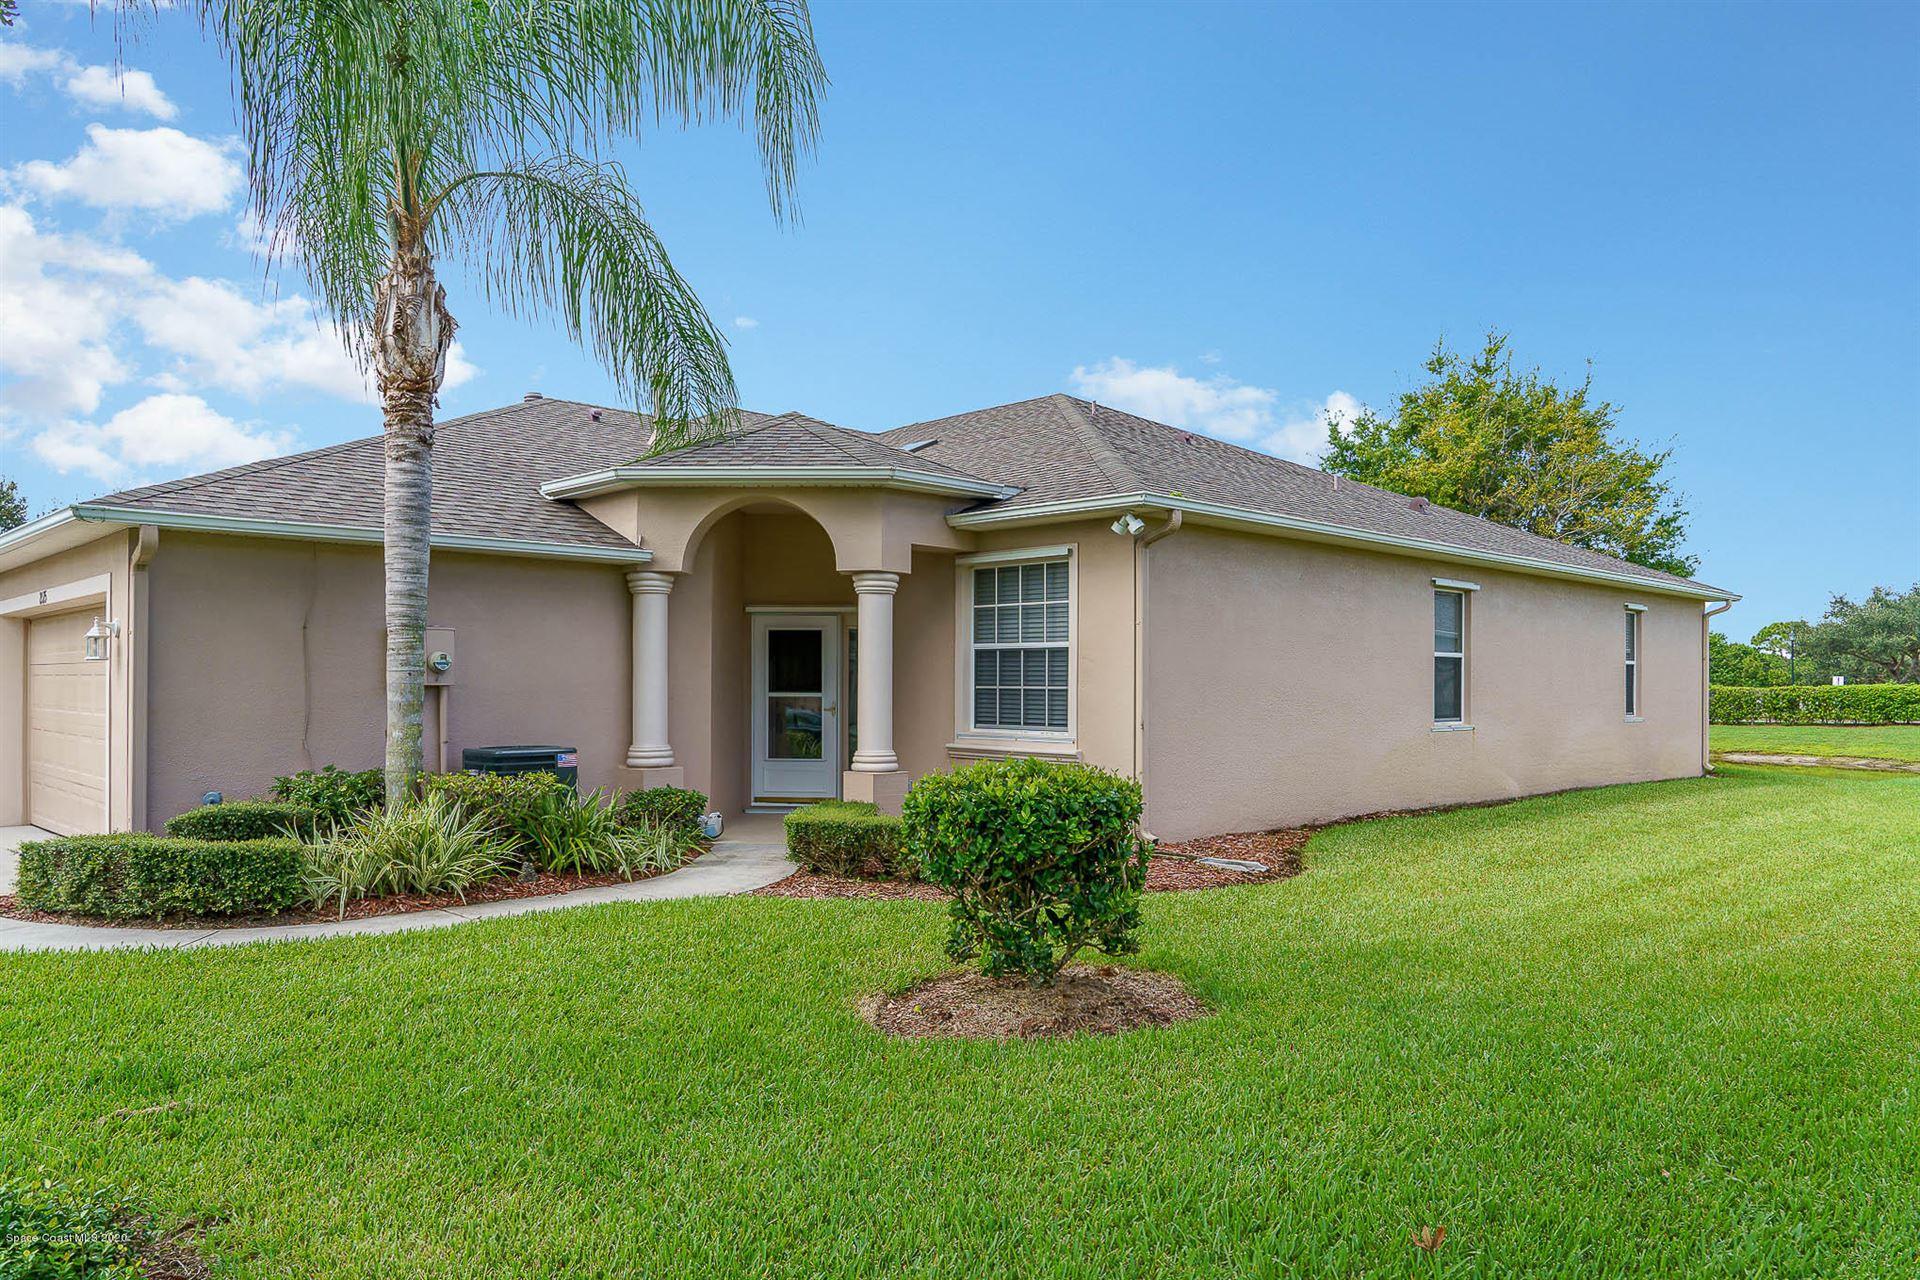 2025 Muirfield Way, Palm Bay, FL 32909 - #: 884865